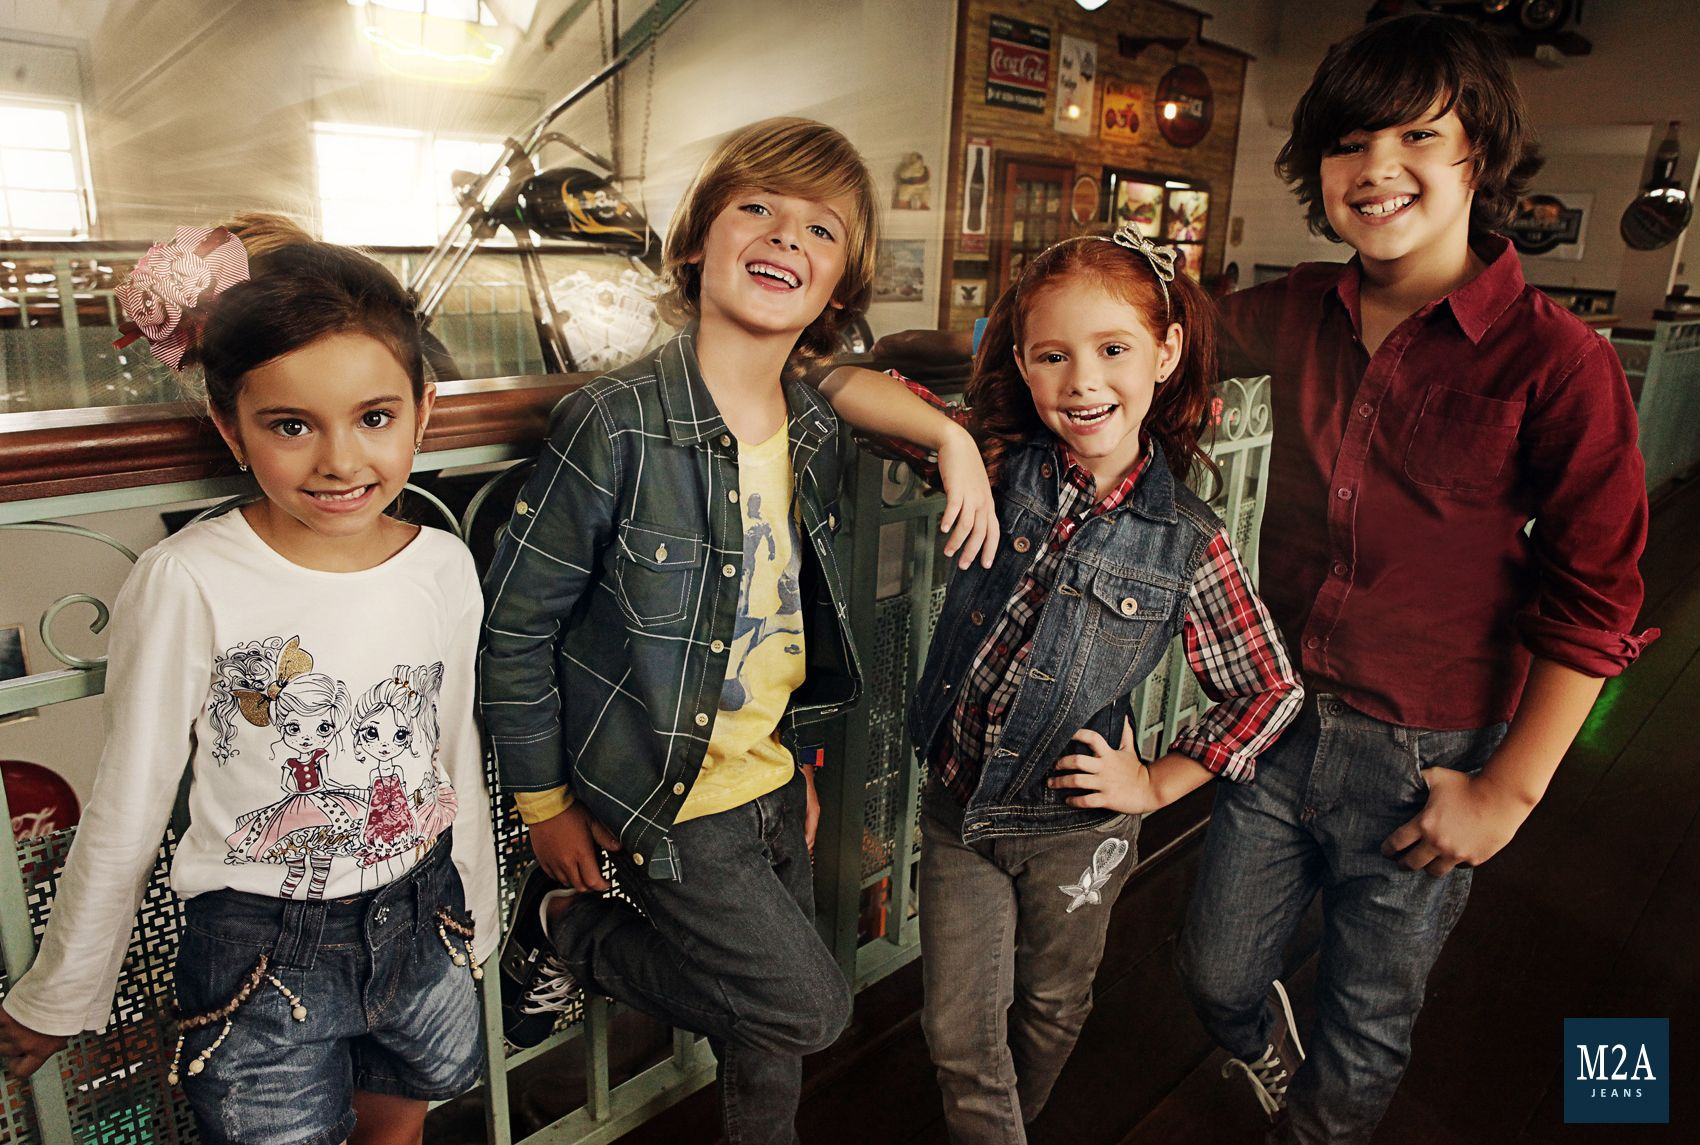 M2A Jeans | Fall Winter 2014 | Kids Collection | Outono Inverno 2014 | Coleção Infantil | calça jeans infantil masculina; look infantil; shorts jeans infantil feminino; vintage; calça jeans infantil feminina; crianças; denim kids; camisa xadrez.